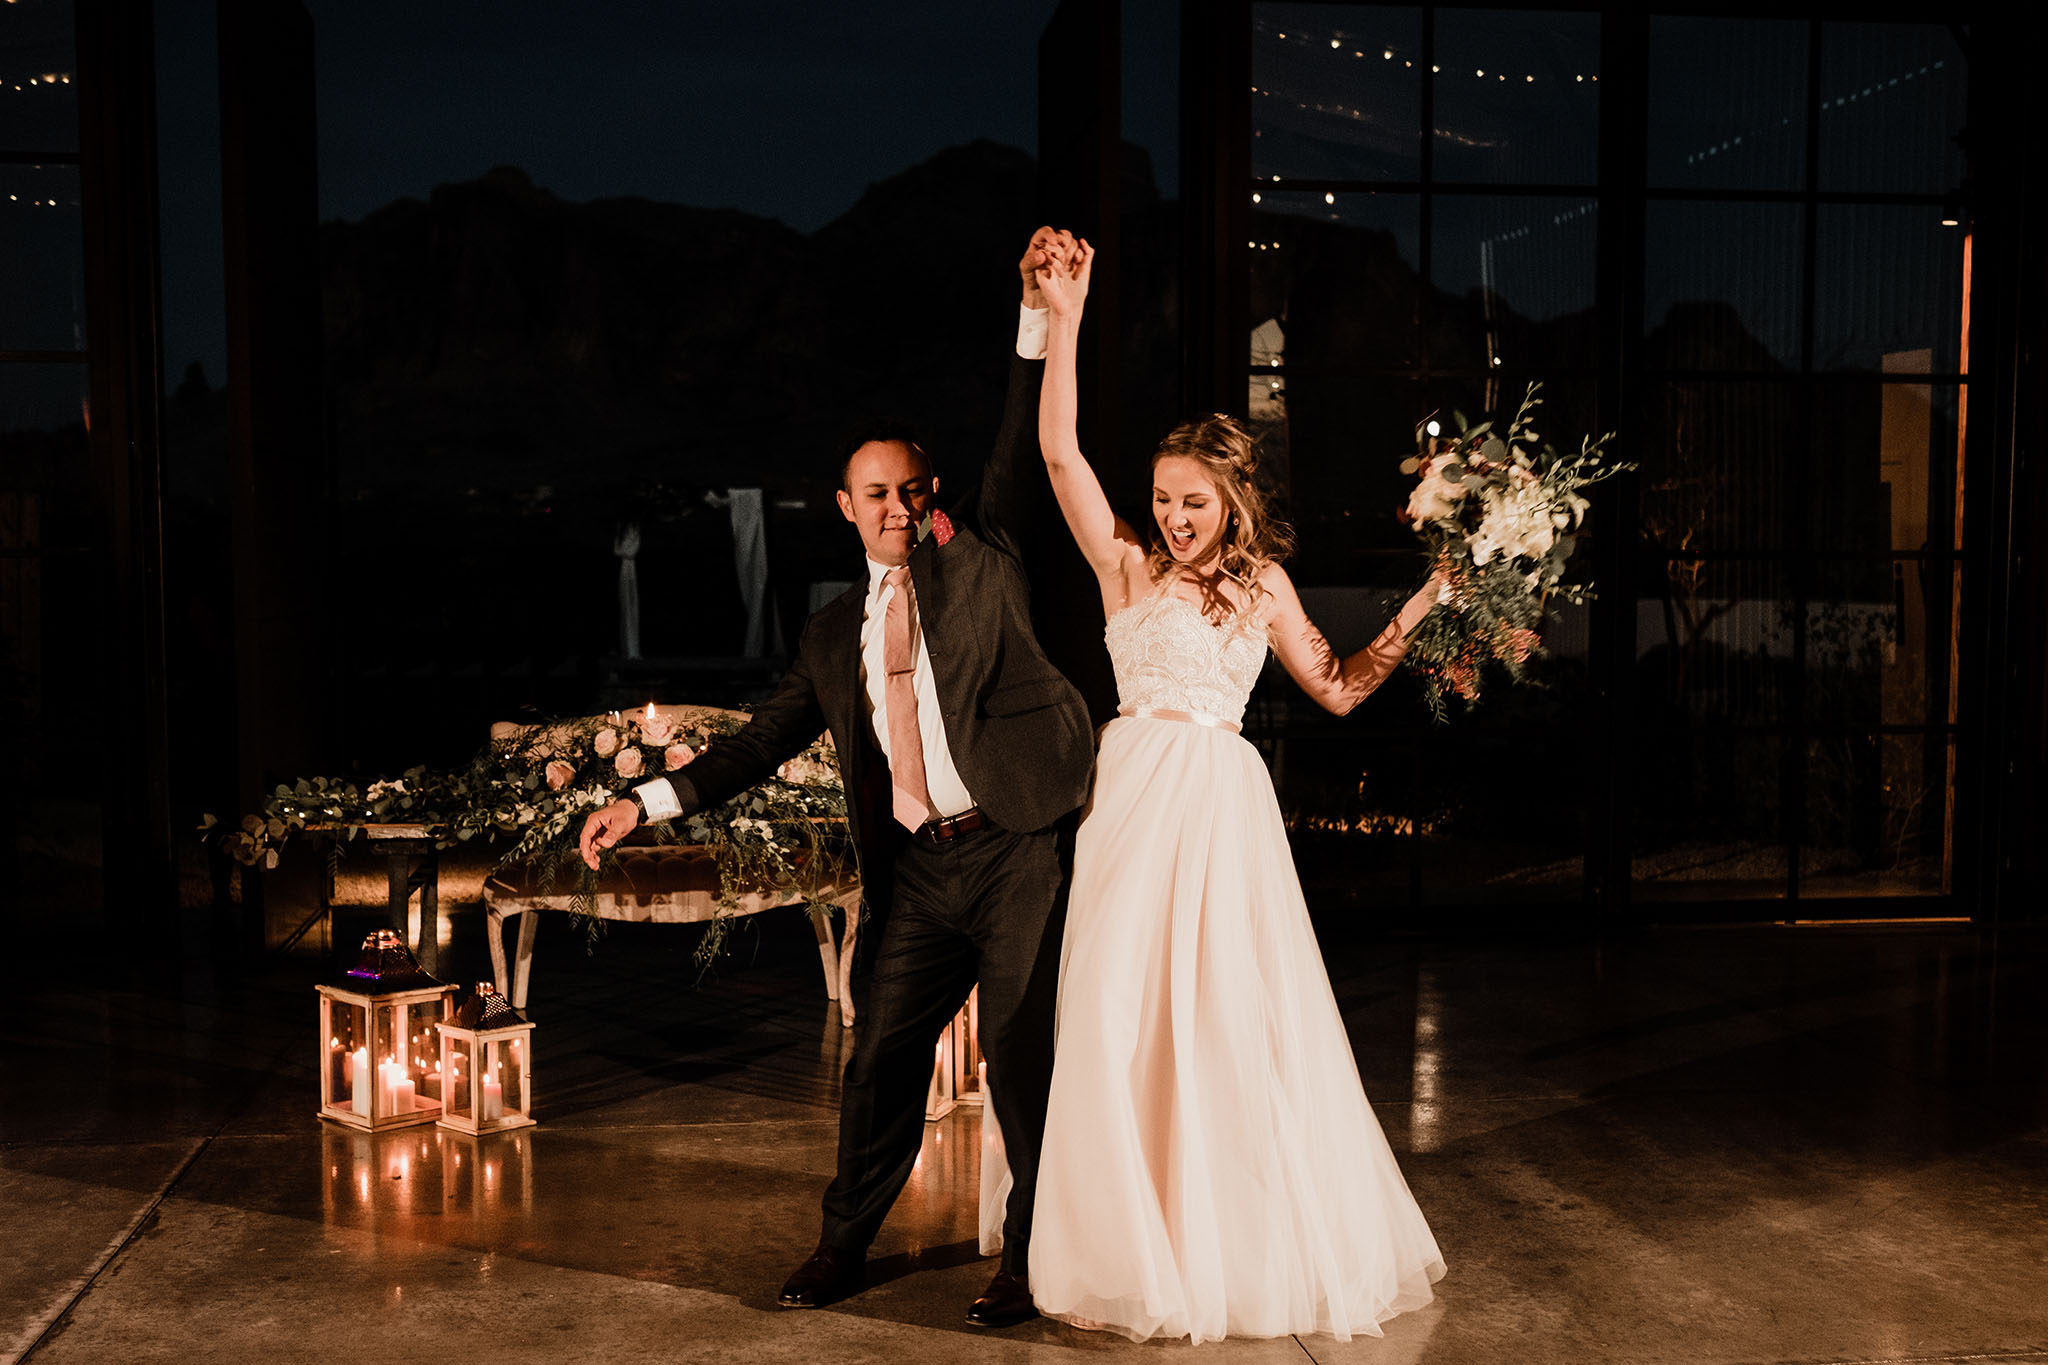 Arizona-Wedding-Photographer-The-Paseo-Venue47.jpg